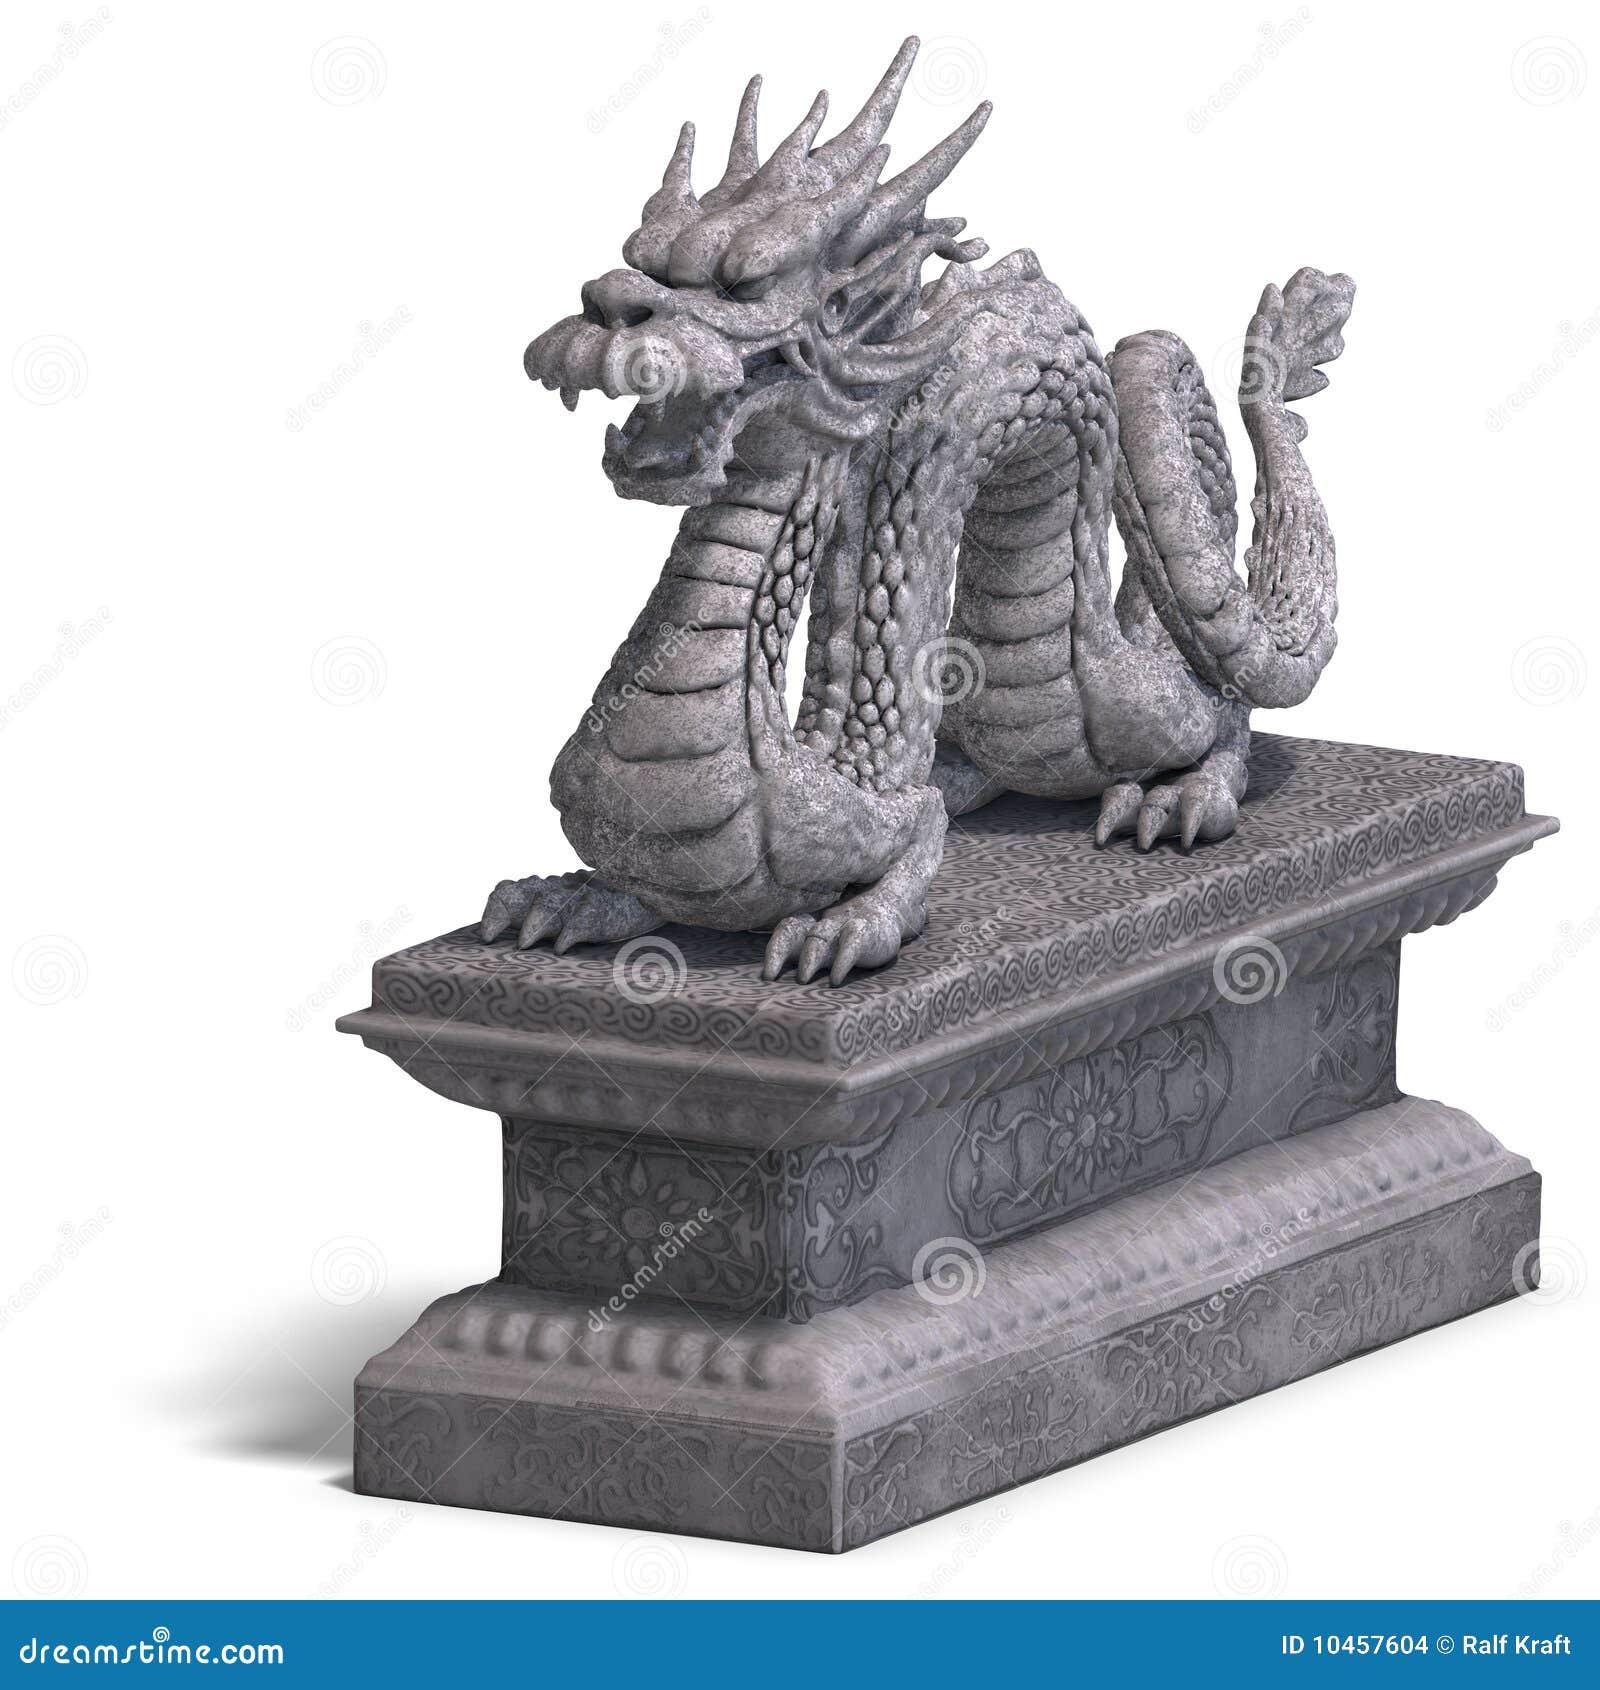 Asian gargoyle statues